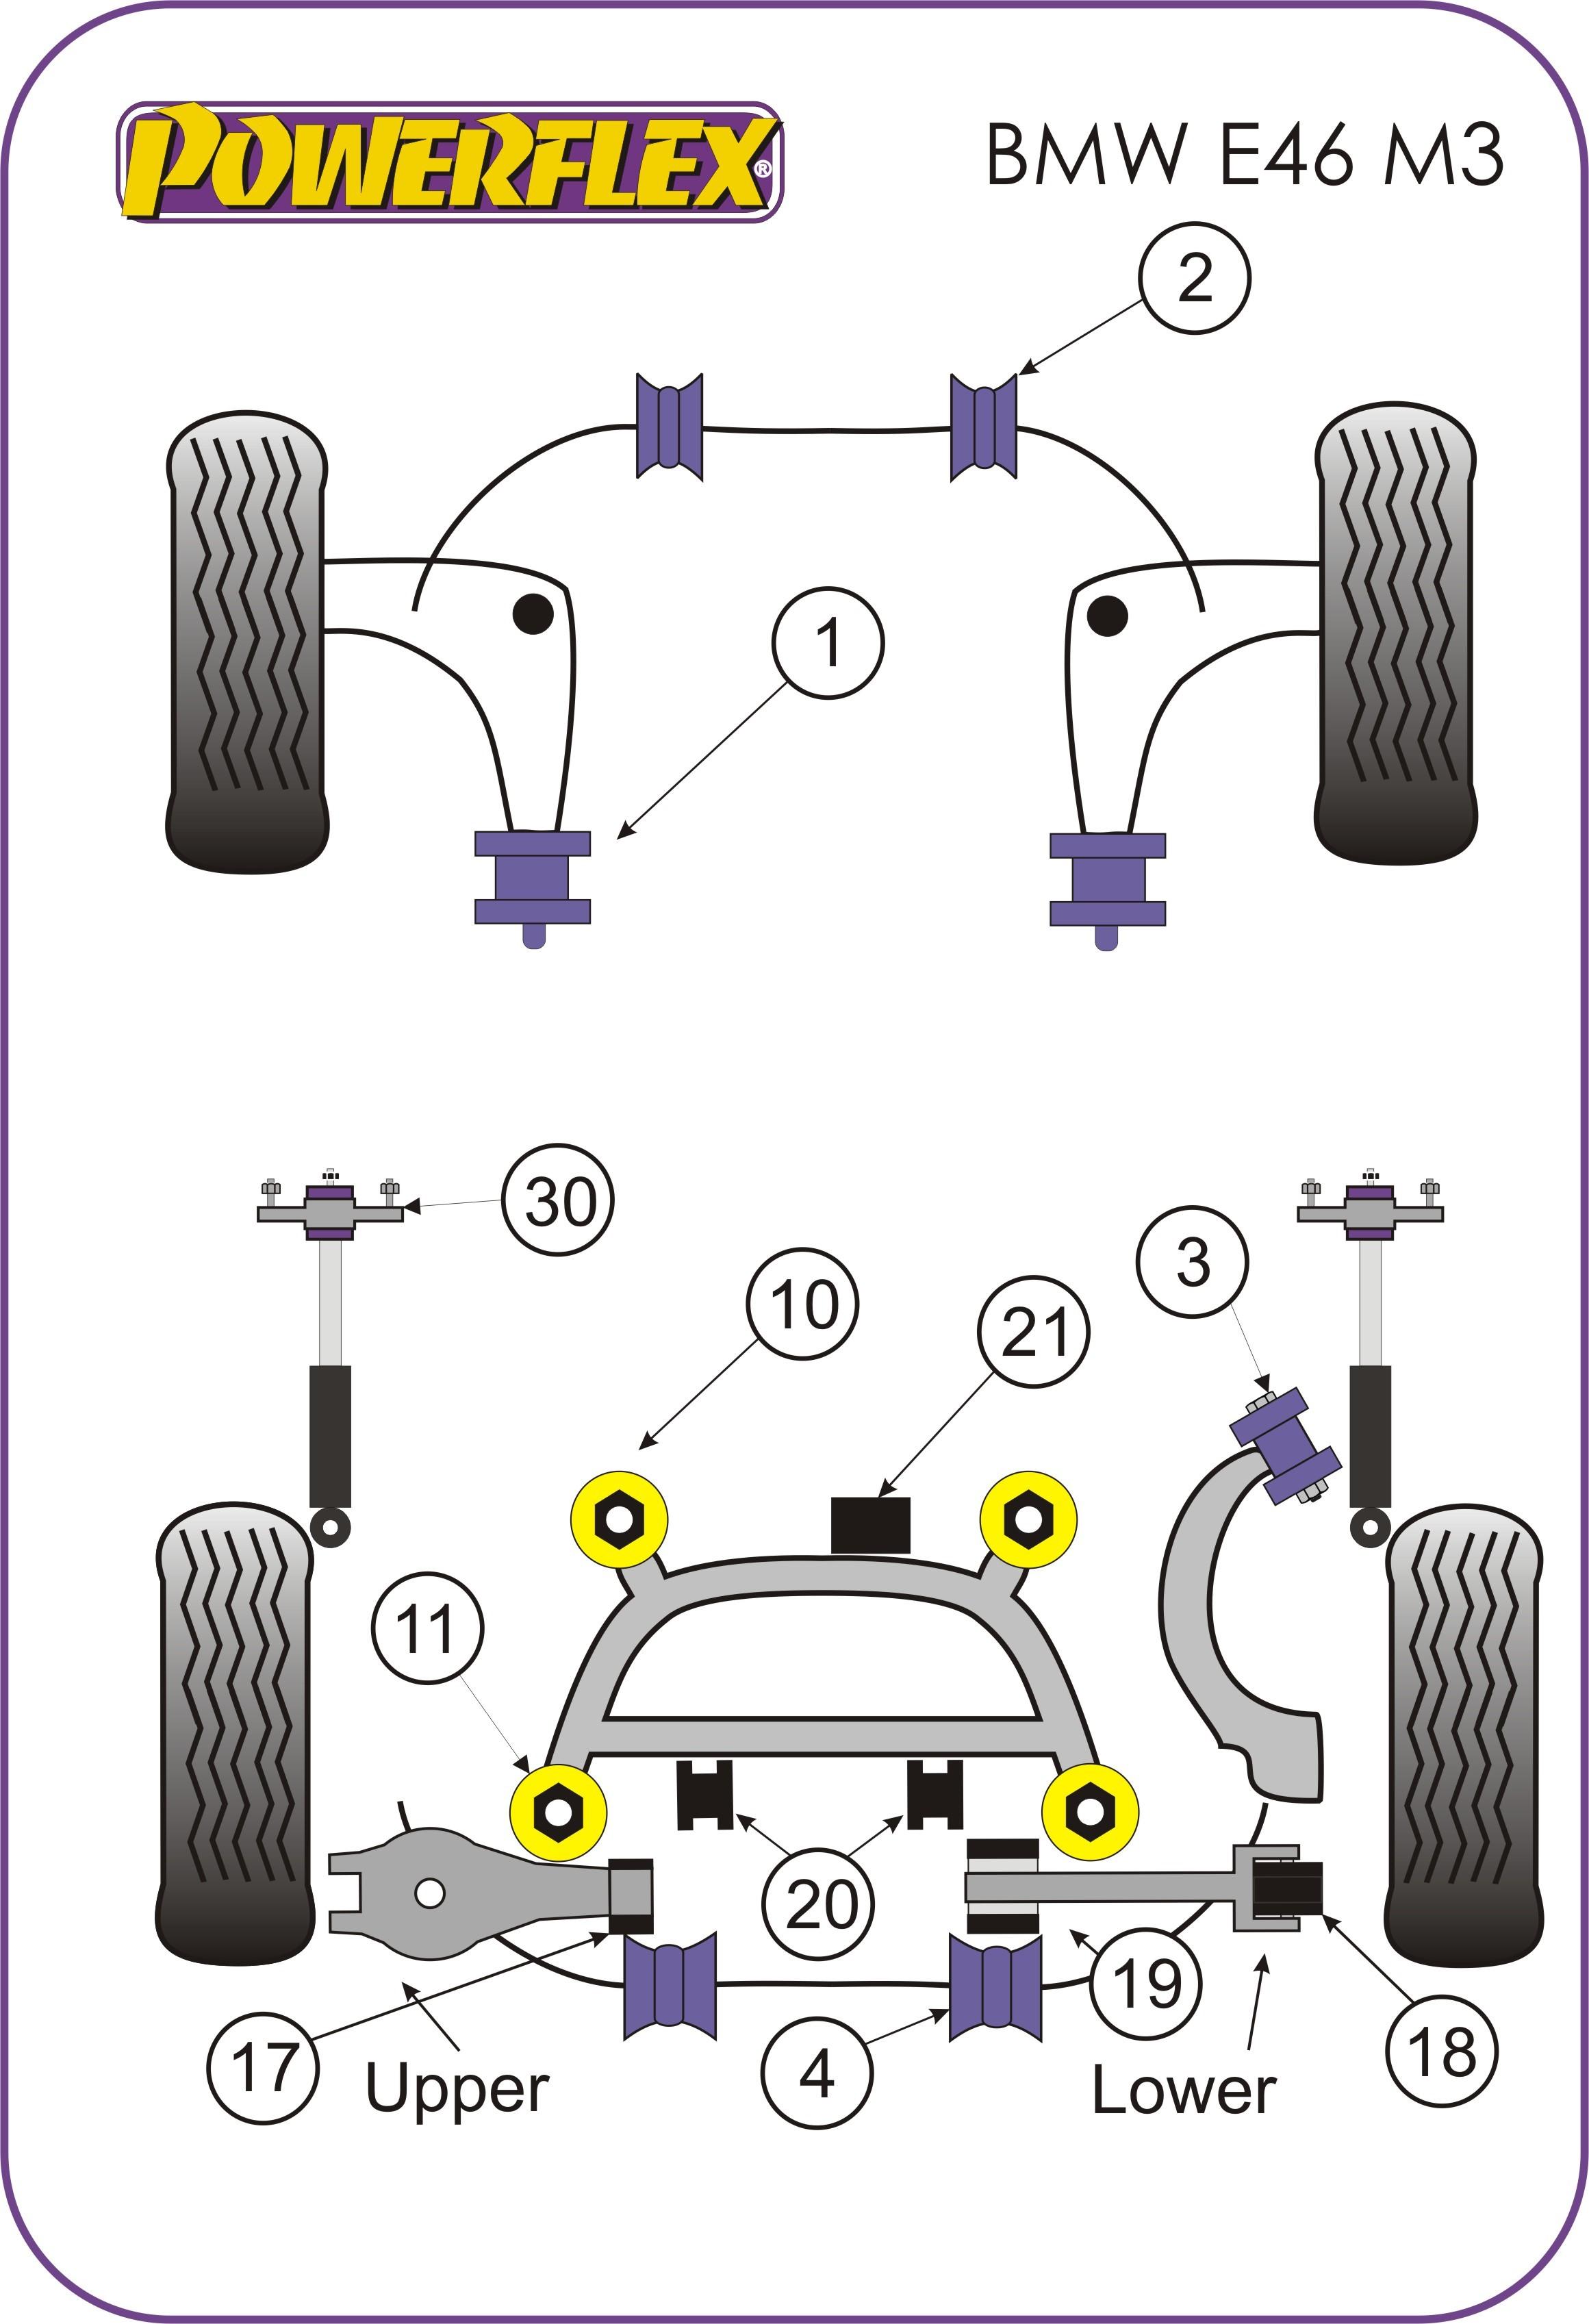 Rear Car Suspension Diagram Pfr5 5630 10 Road Series Pack Of 2 Powerflex Poly Bushes Of Rear Car Suspension Diagram